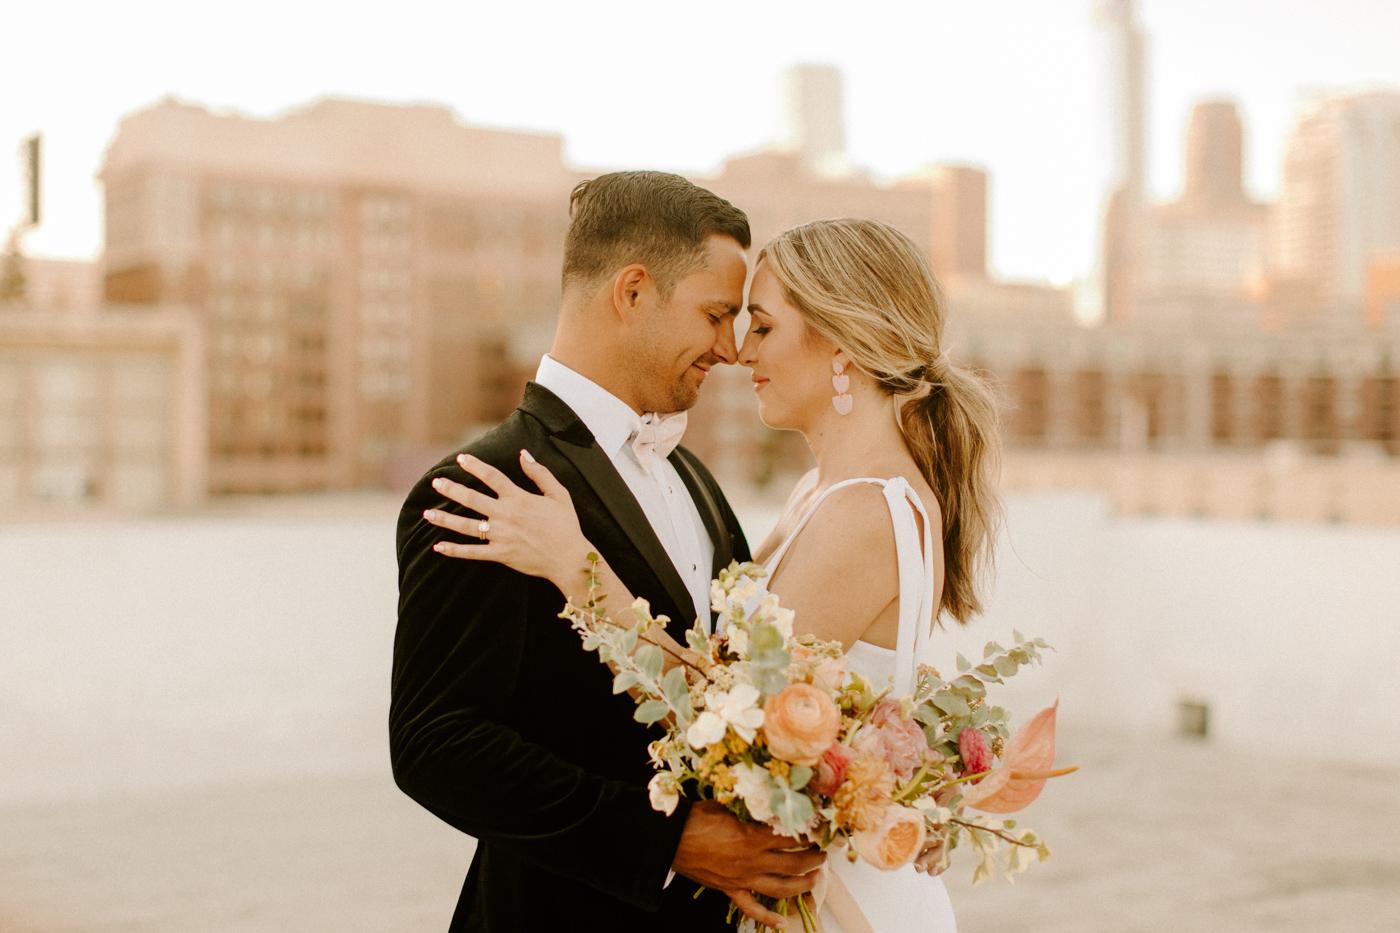 Brianna Broyles Photography - The Shootout Society- Rooftop Modern Wedding-181.jpg